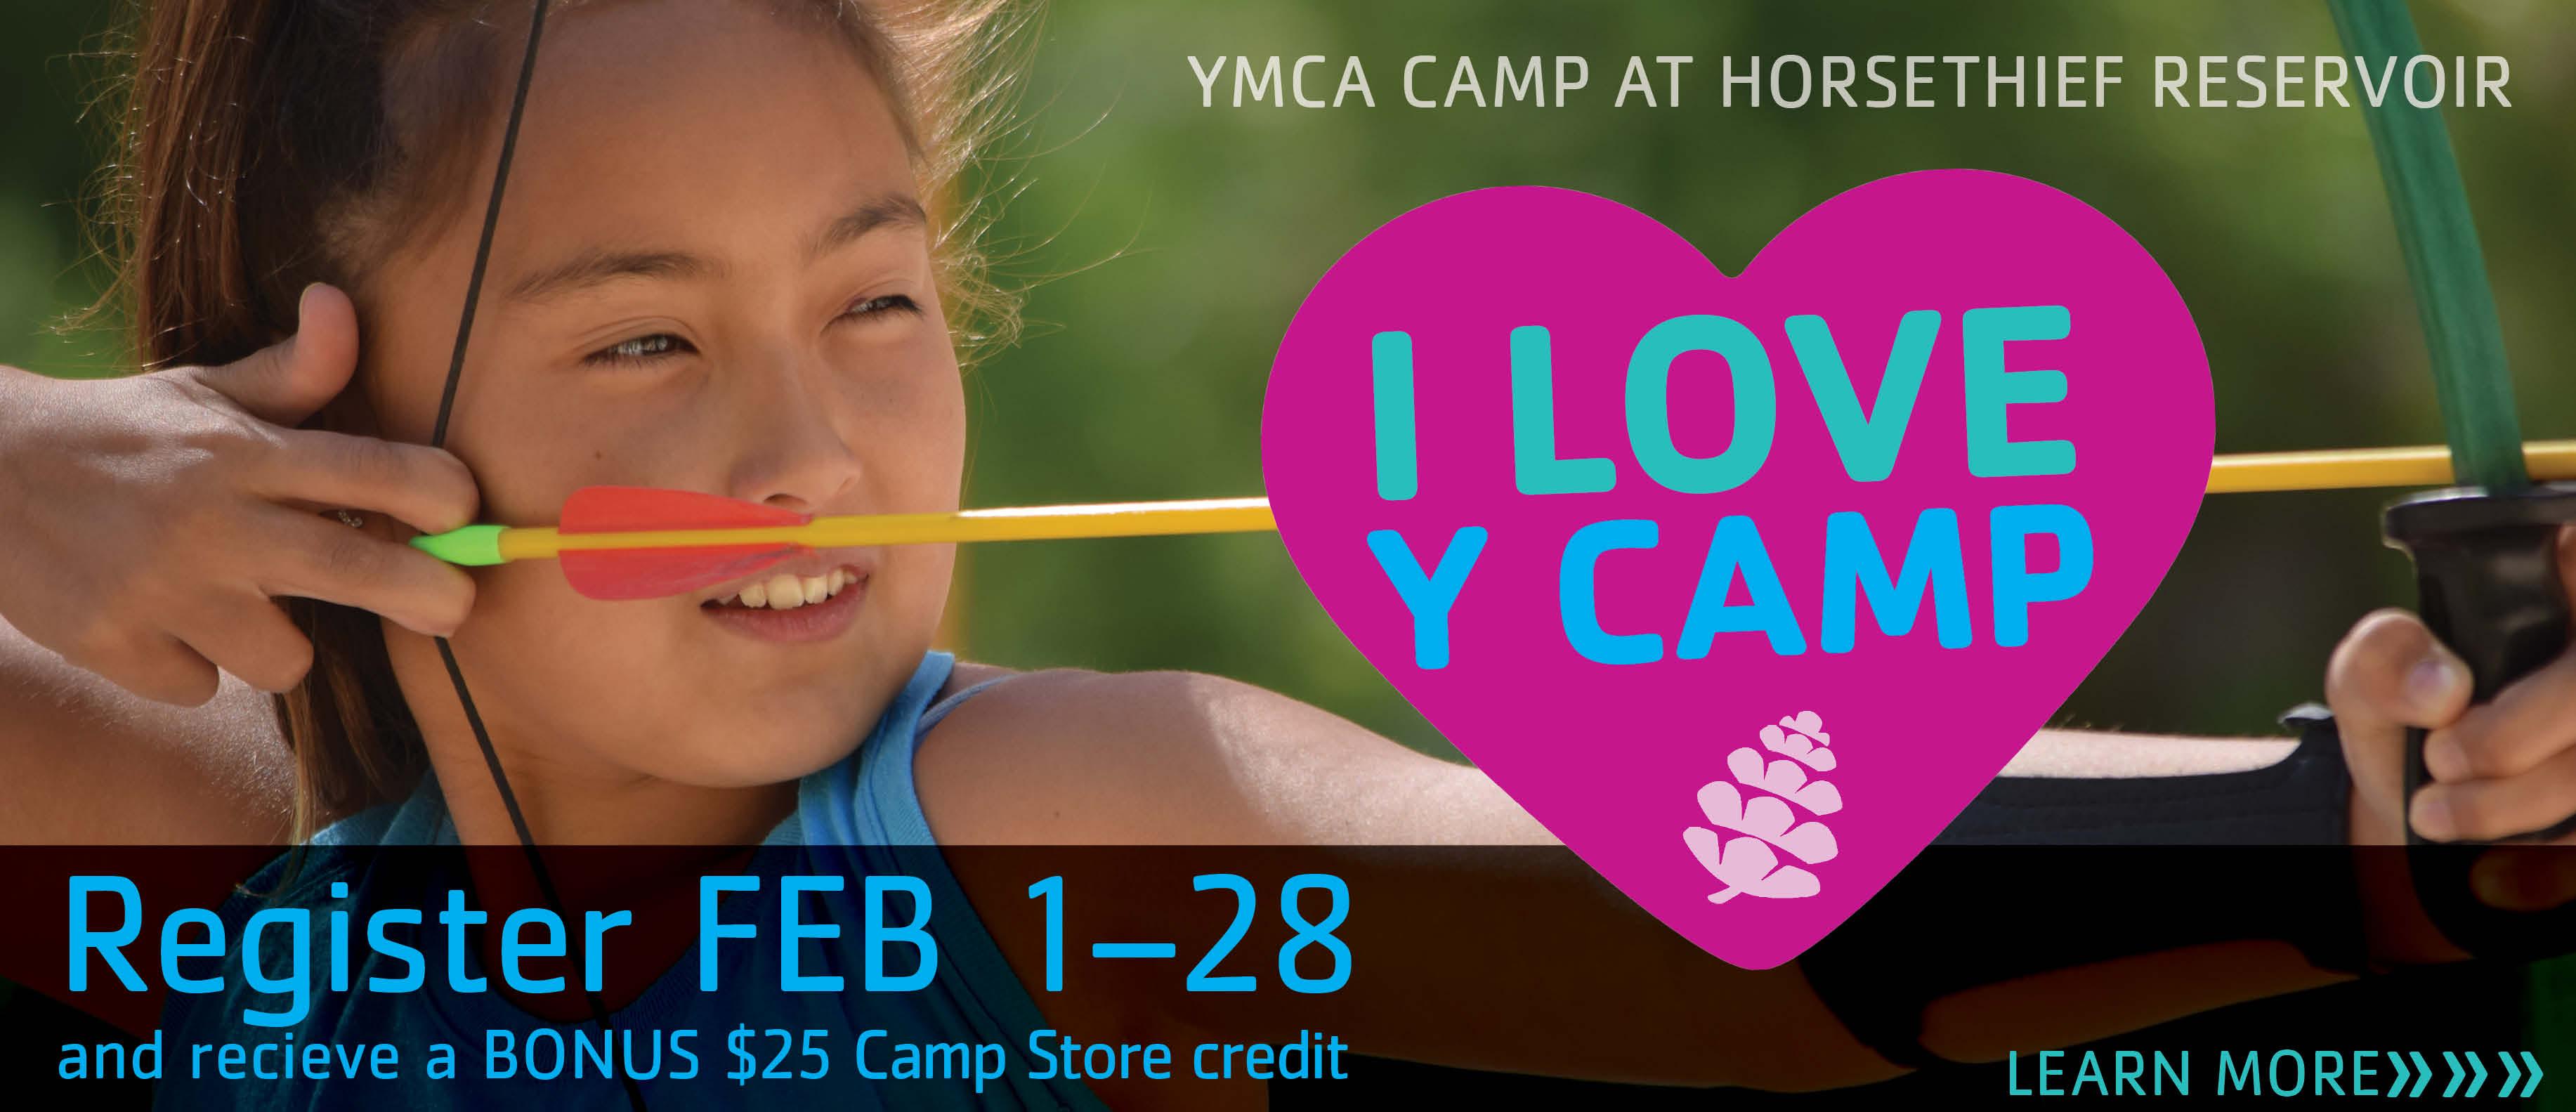 I Love Camp. Register Feb 1-28 and receive a bonus $25 Camp Store credit.